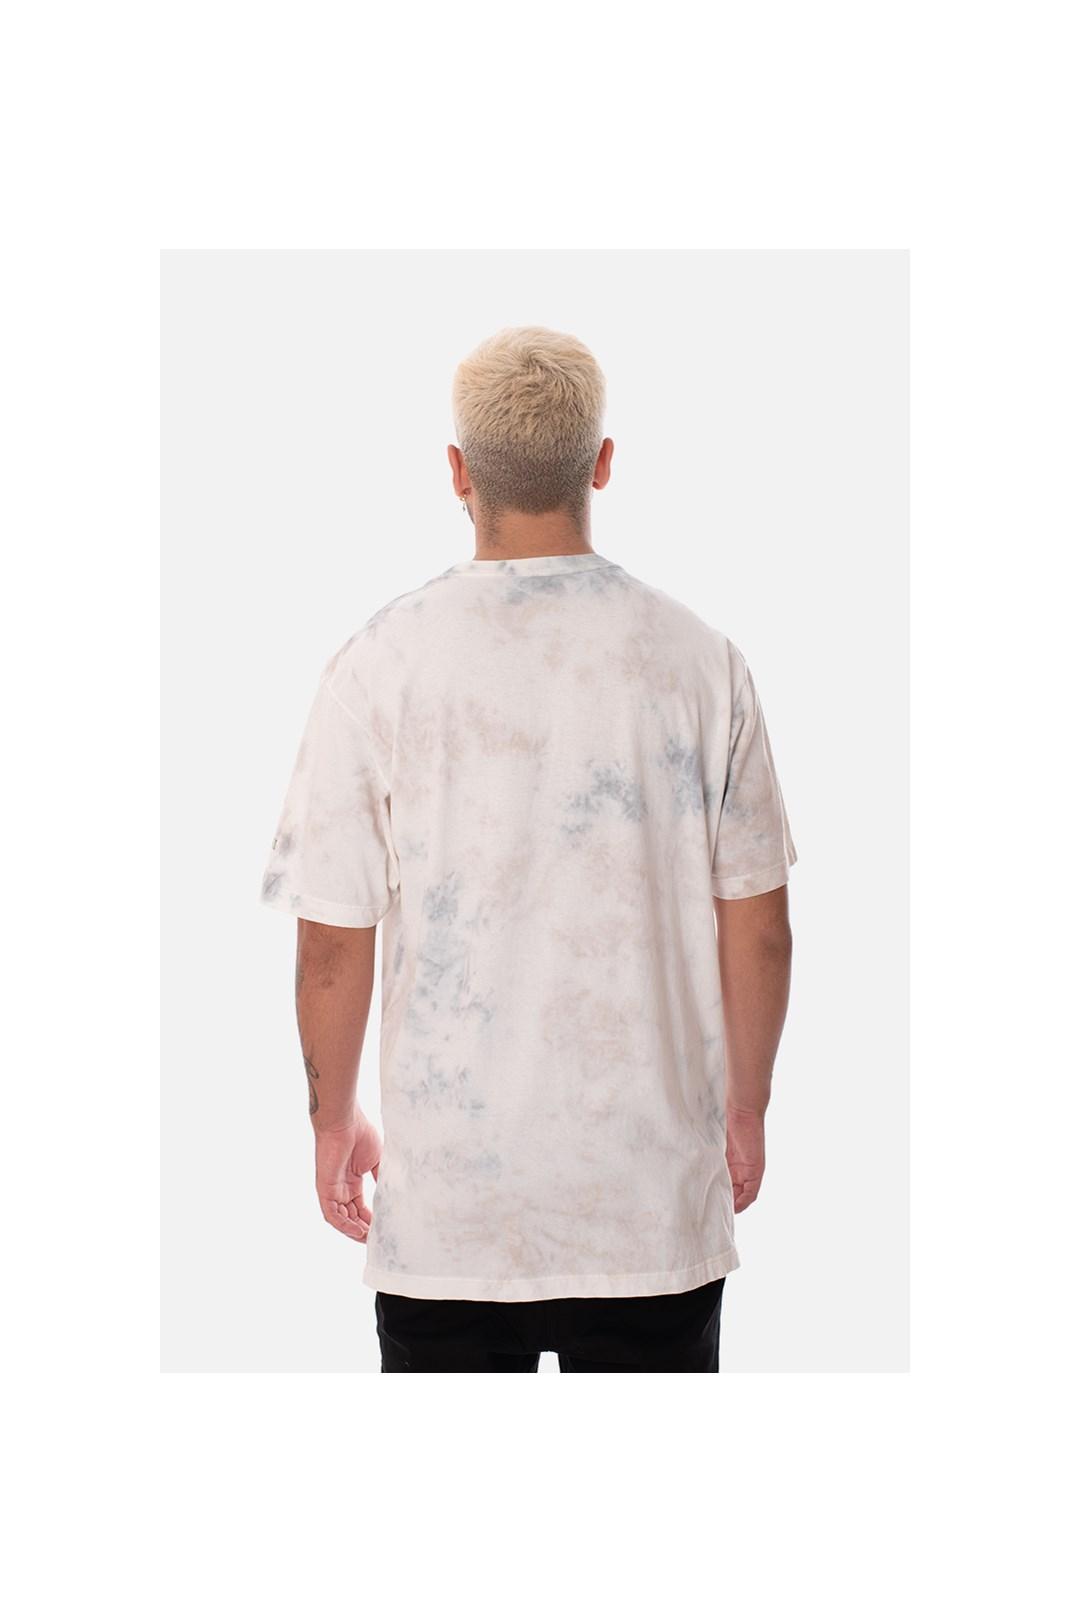 Camiseta Regular Approve Ruínas Medusa Branca Marmorizada